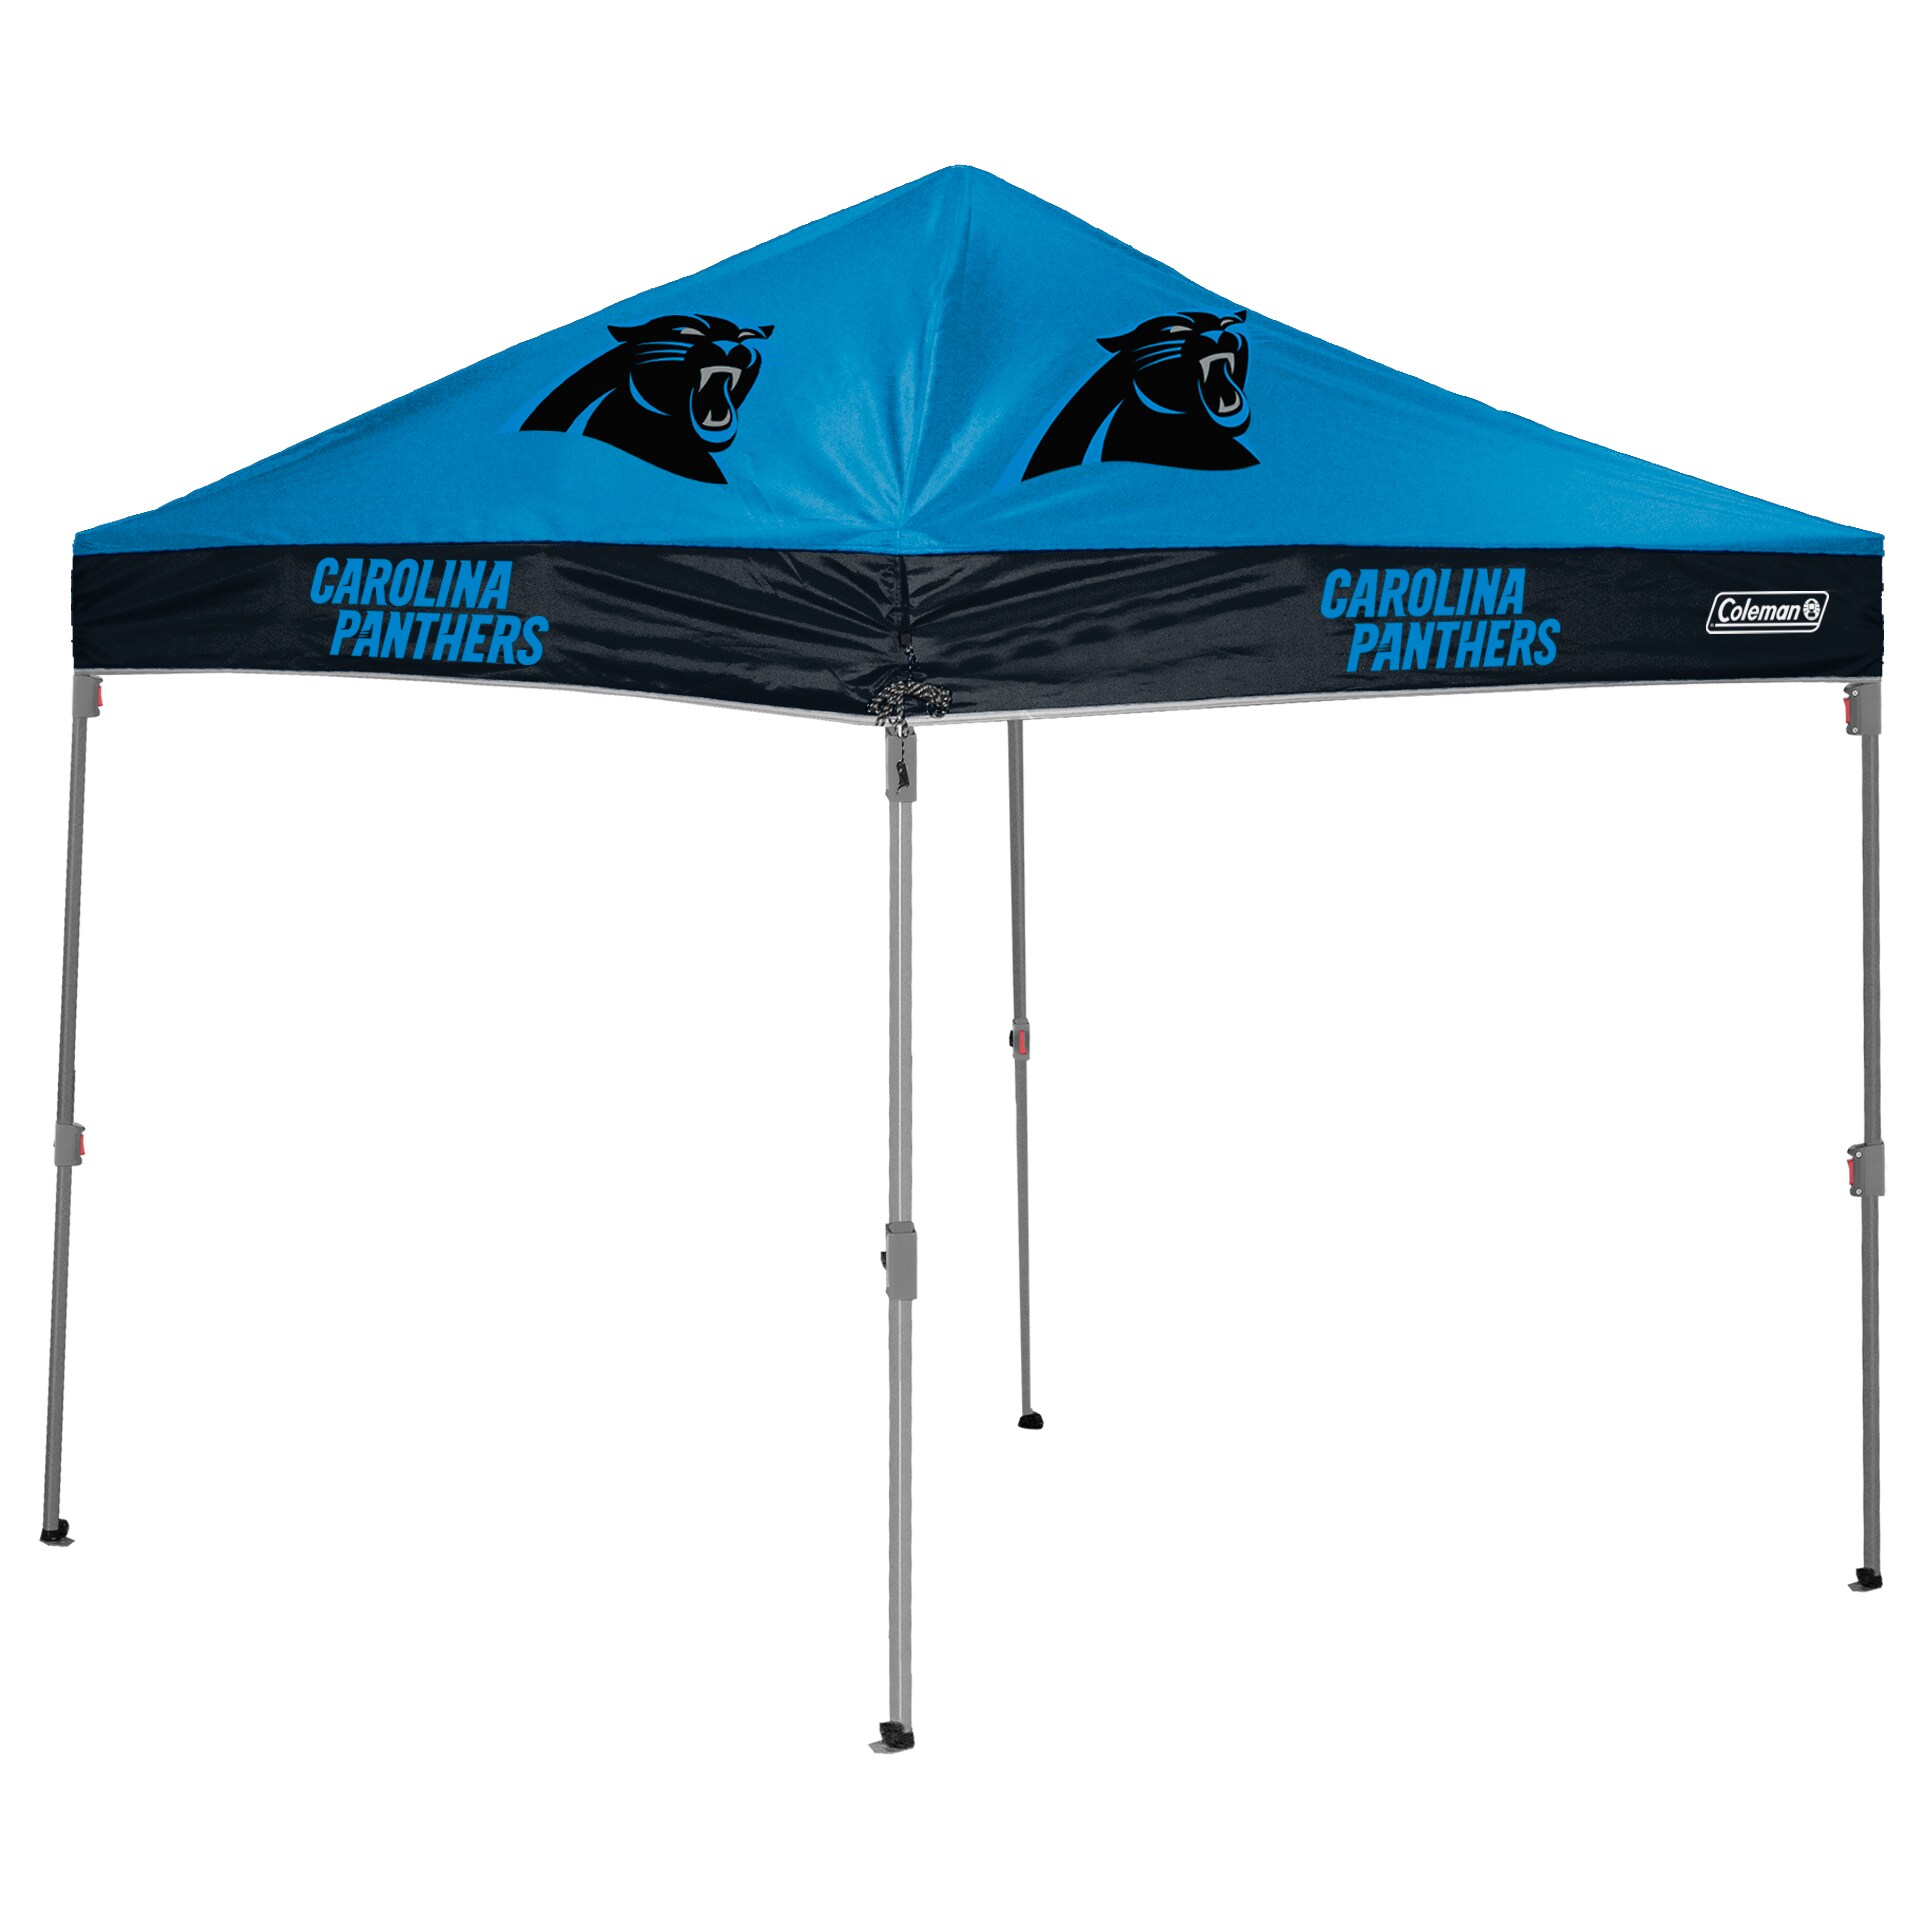 Carolina Panthers Coleman 10' x 10' 2-Tone Straight Leg Canopy Tent